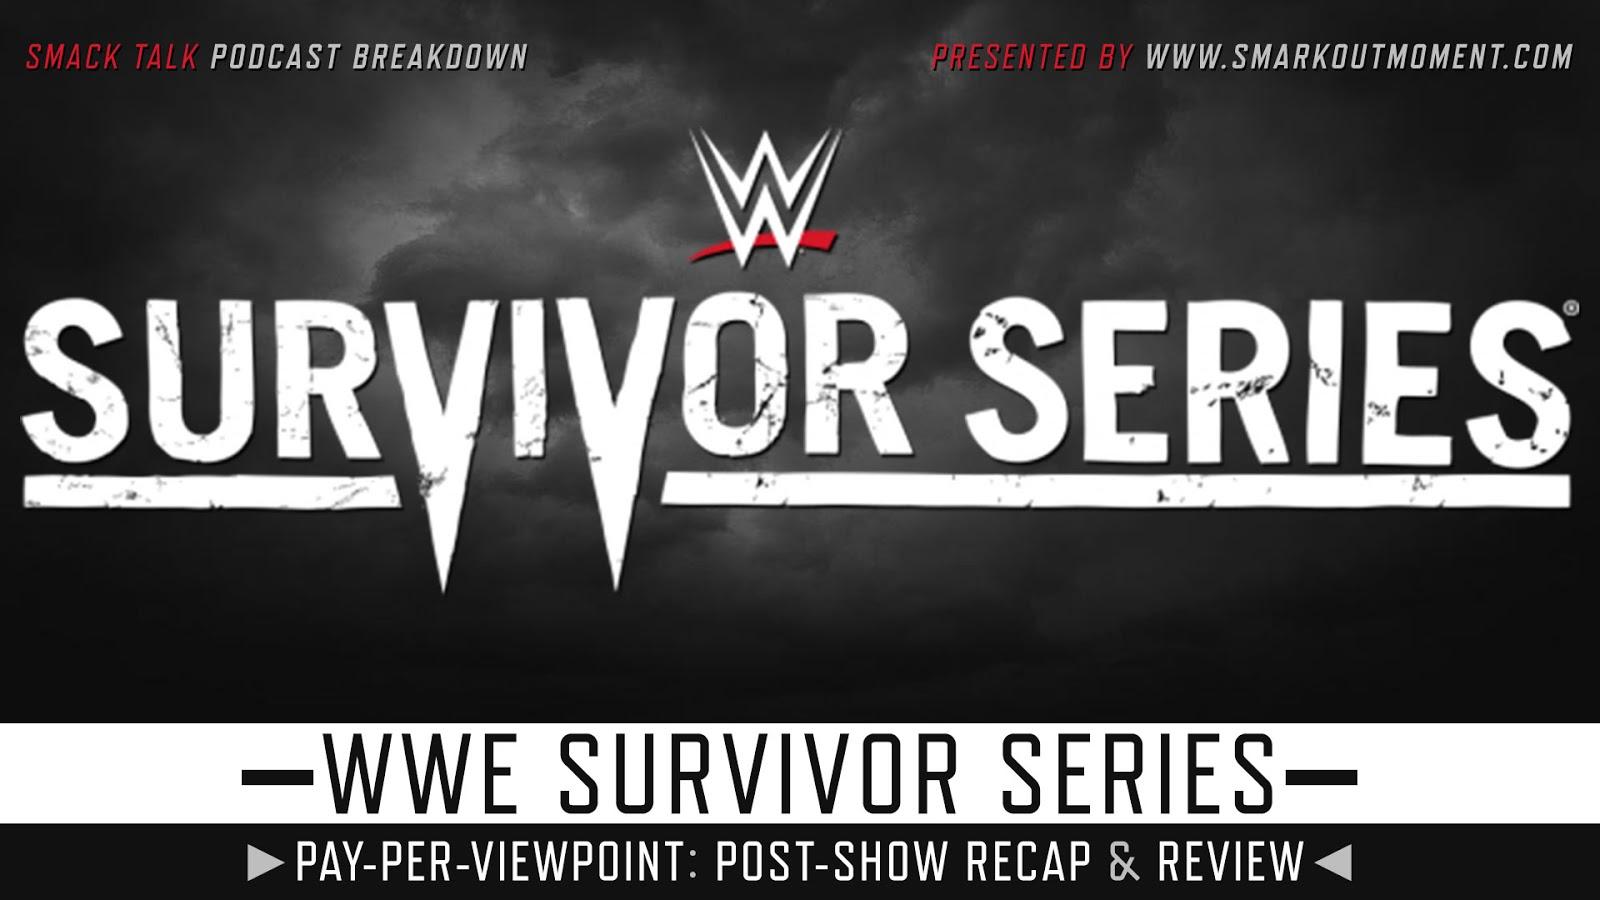 WWE Survivor Series 2019 Recap and Review Podcast